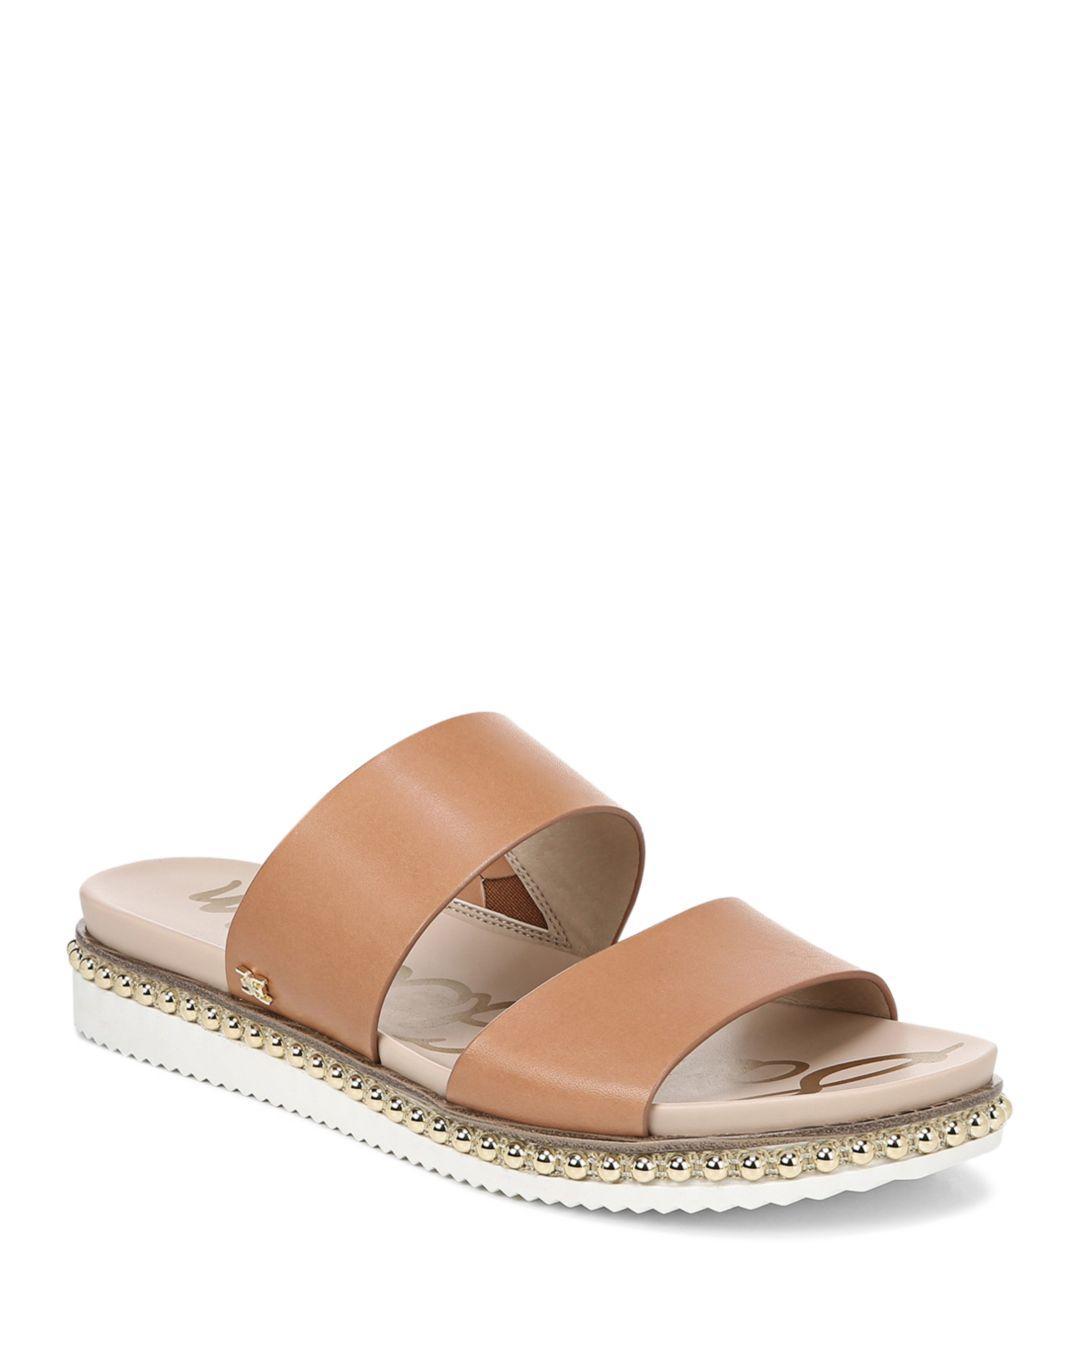 f5055dd77d0cee Lyst - Sam Edelman Women s Asha Studded Leather Slide Sandals